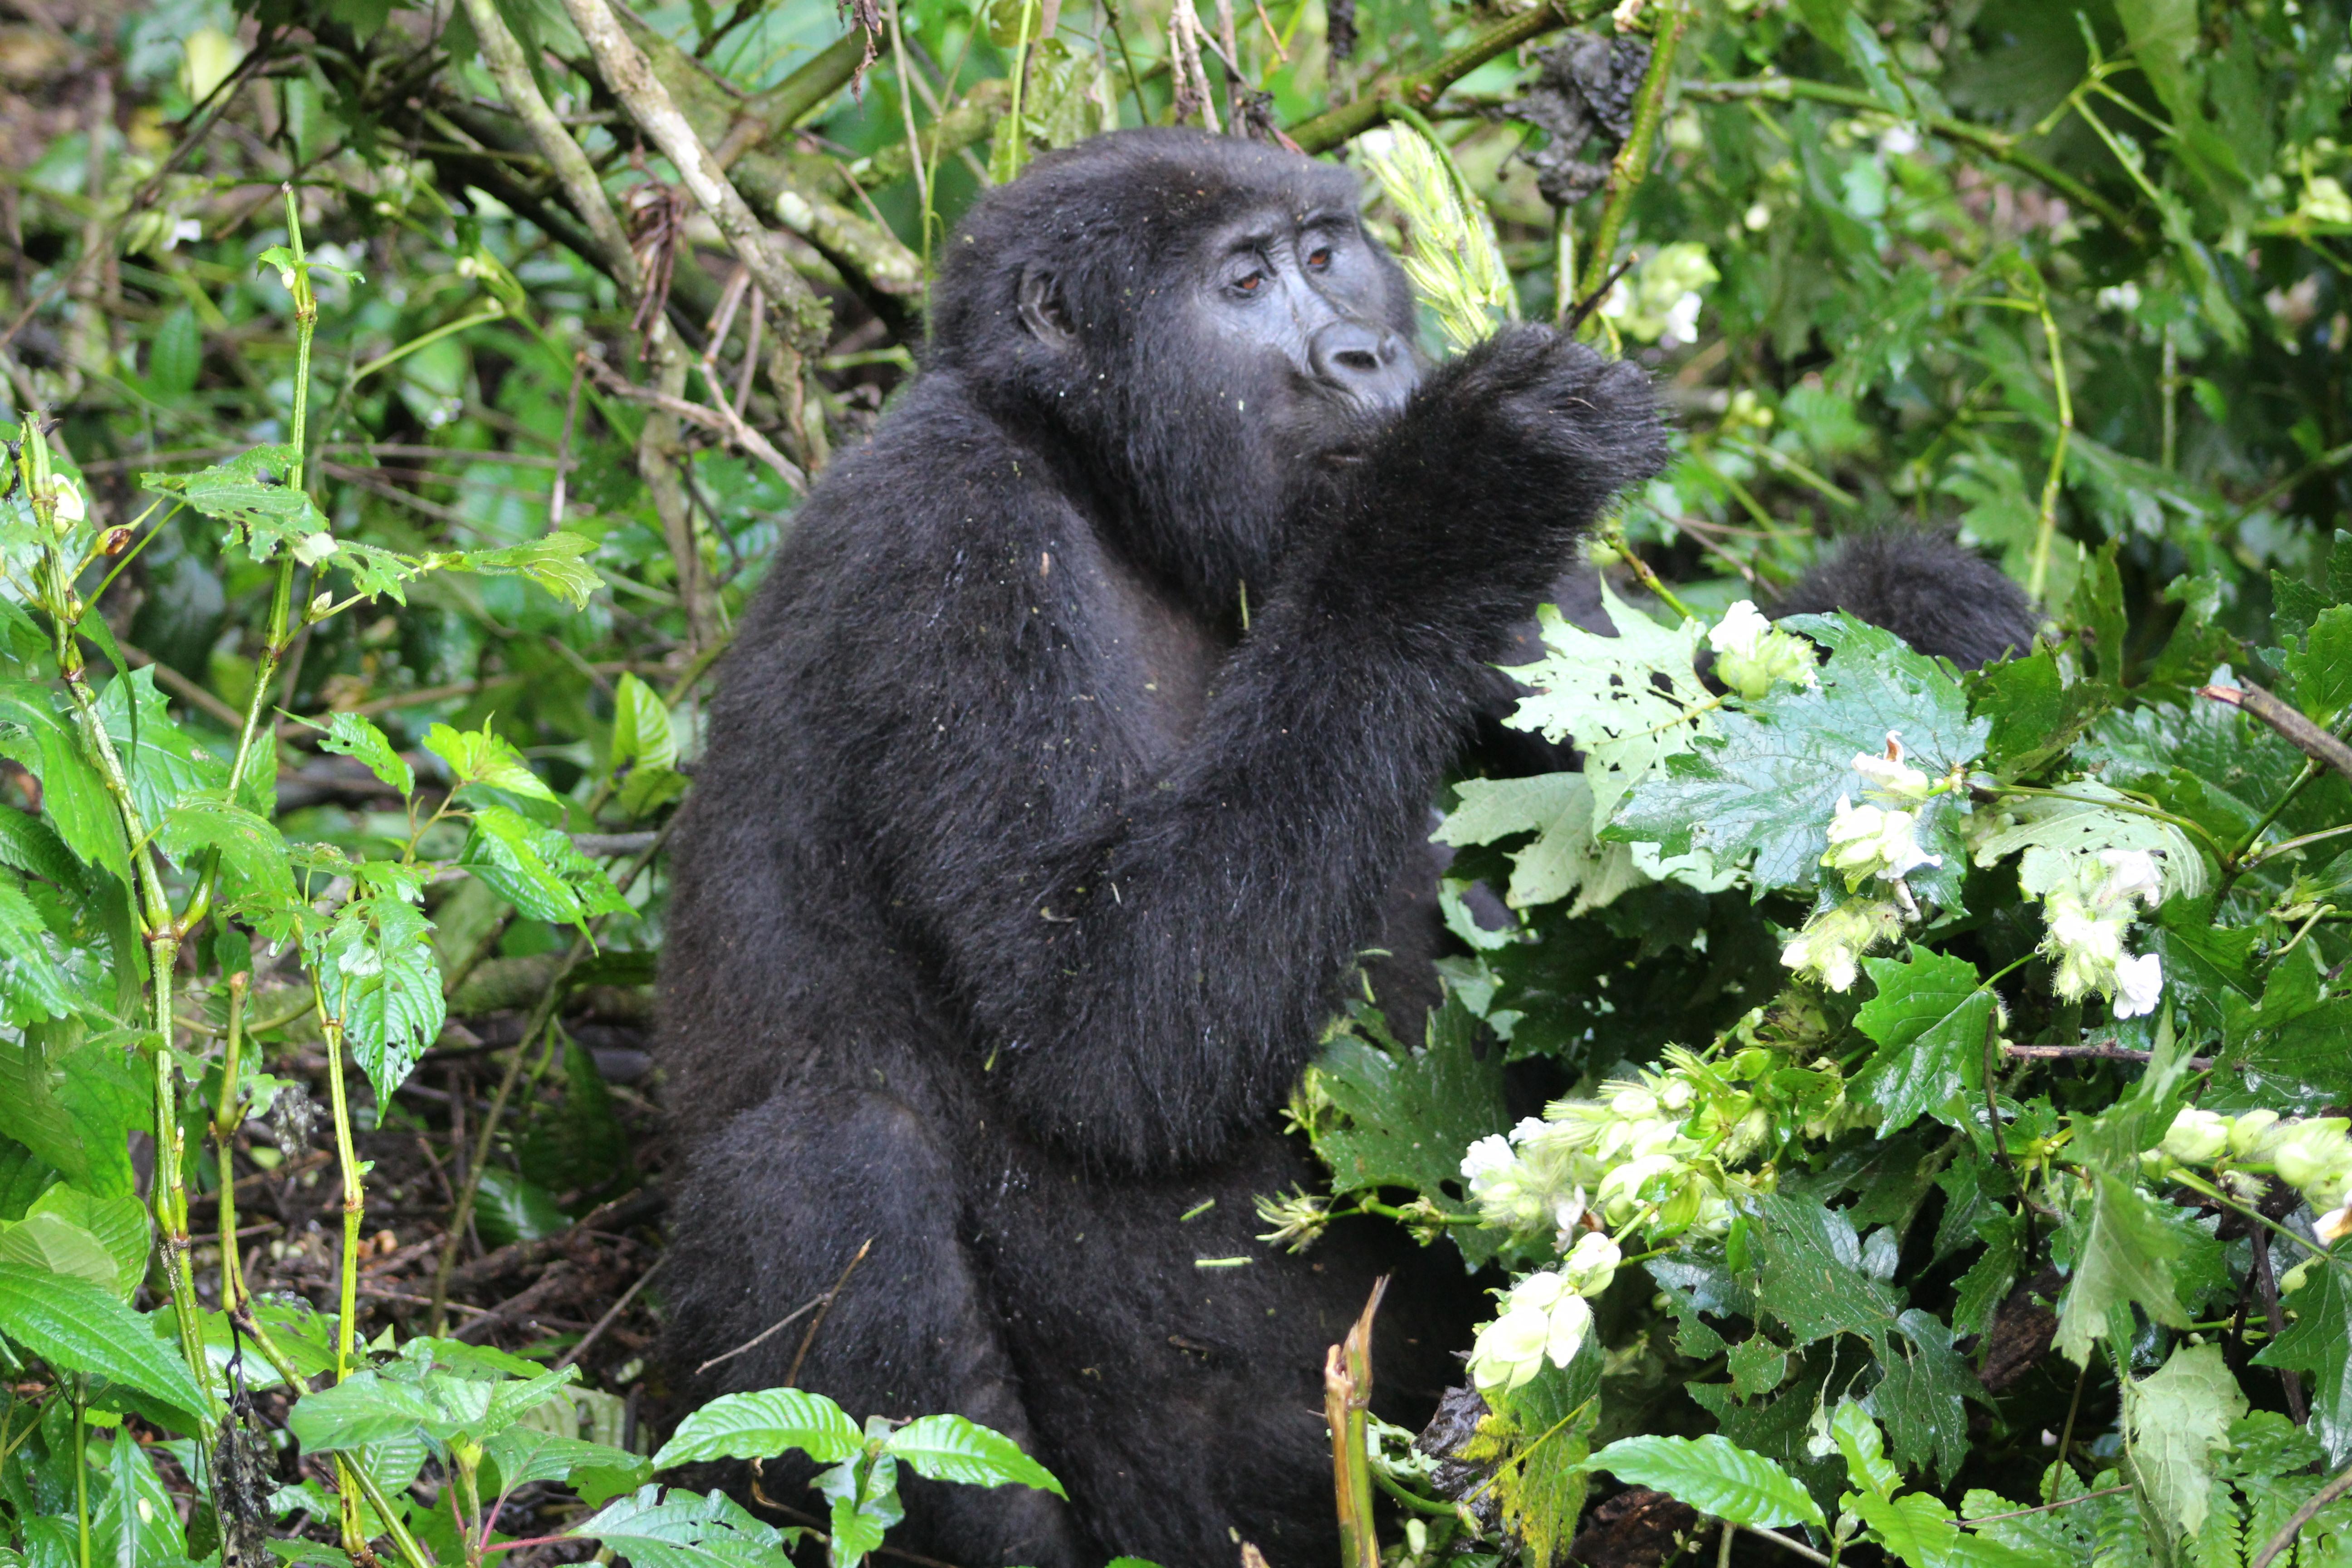 2021 Discounted Uganda Gorilla trekking permit fees